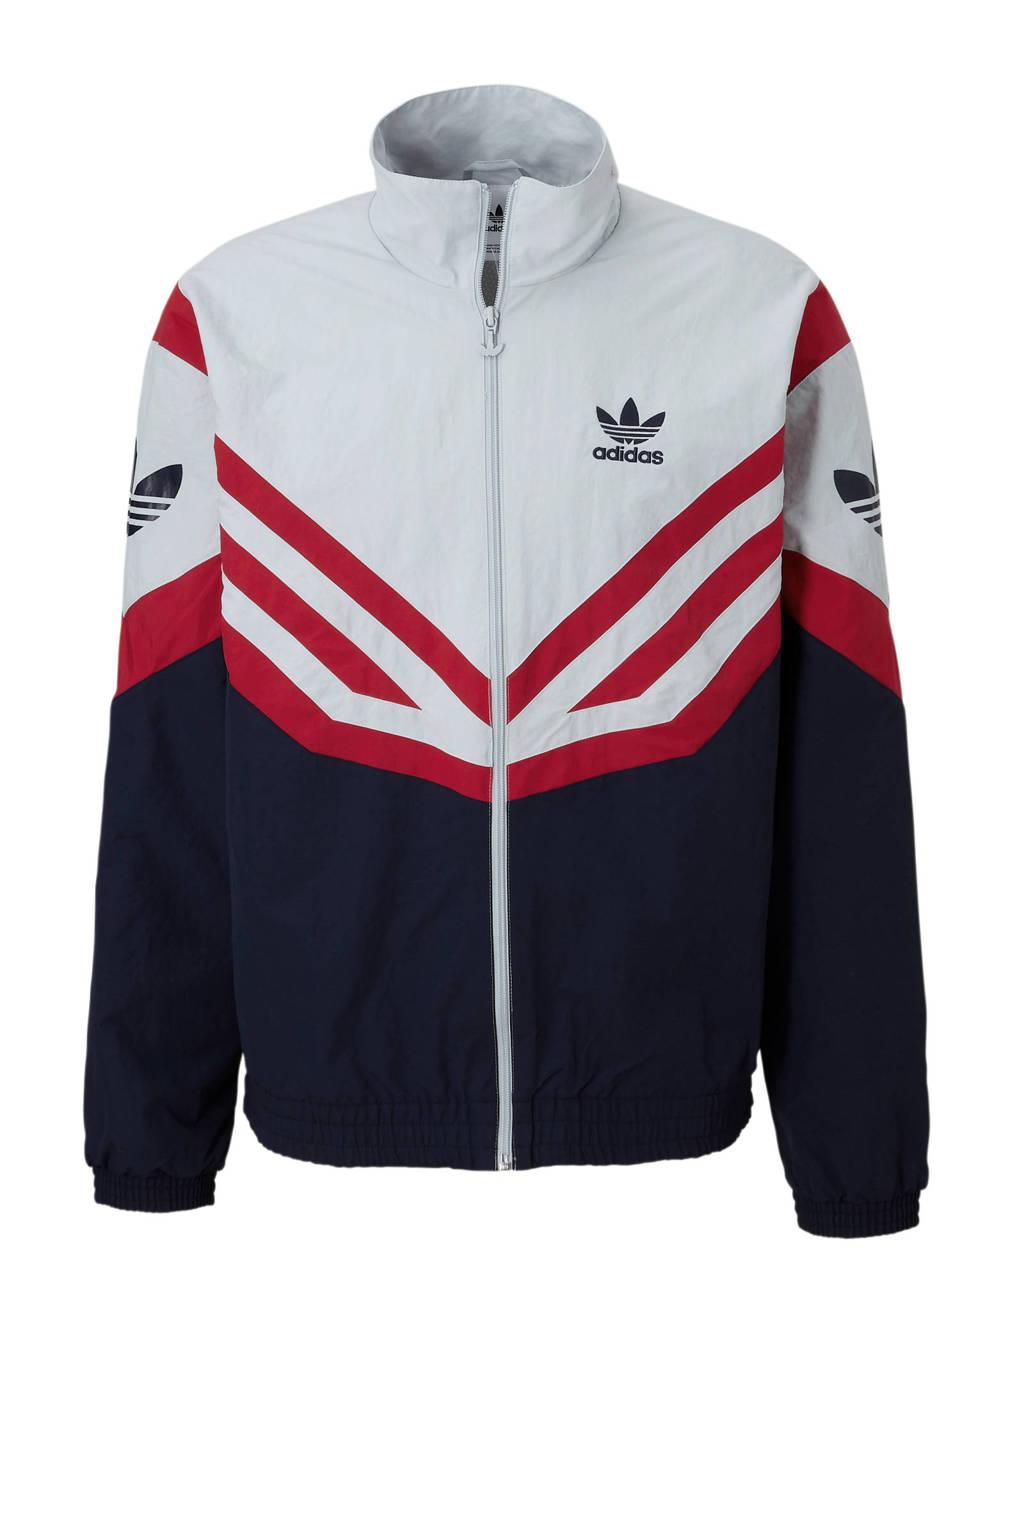 adidas originals   jack, Grijs/rood/donkerblauw